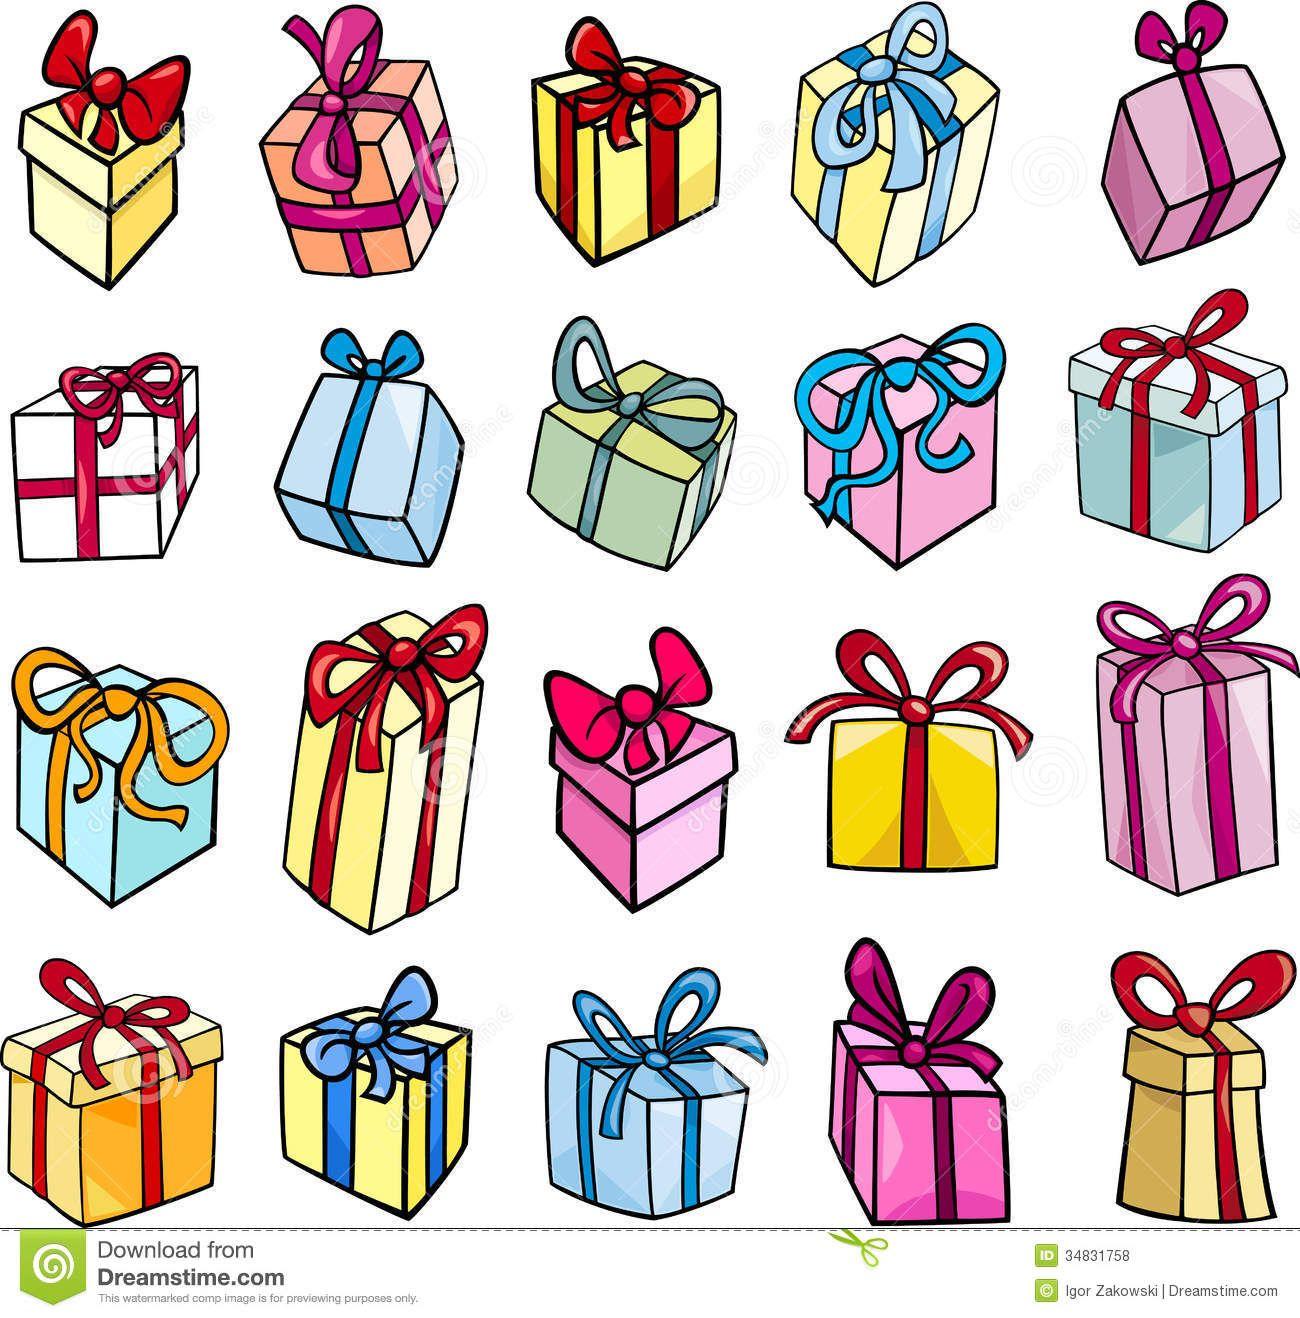 Christmas or birthday gift clip art set download from over 53 christmas or birthday gift clip art set download from over 53 million high quality stock negle Gallery